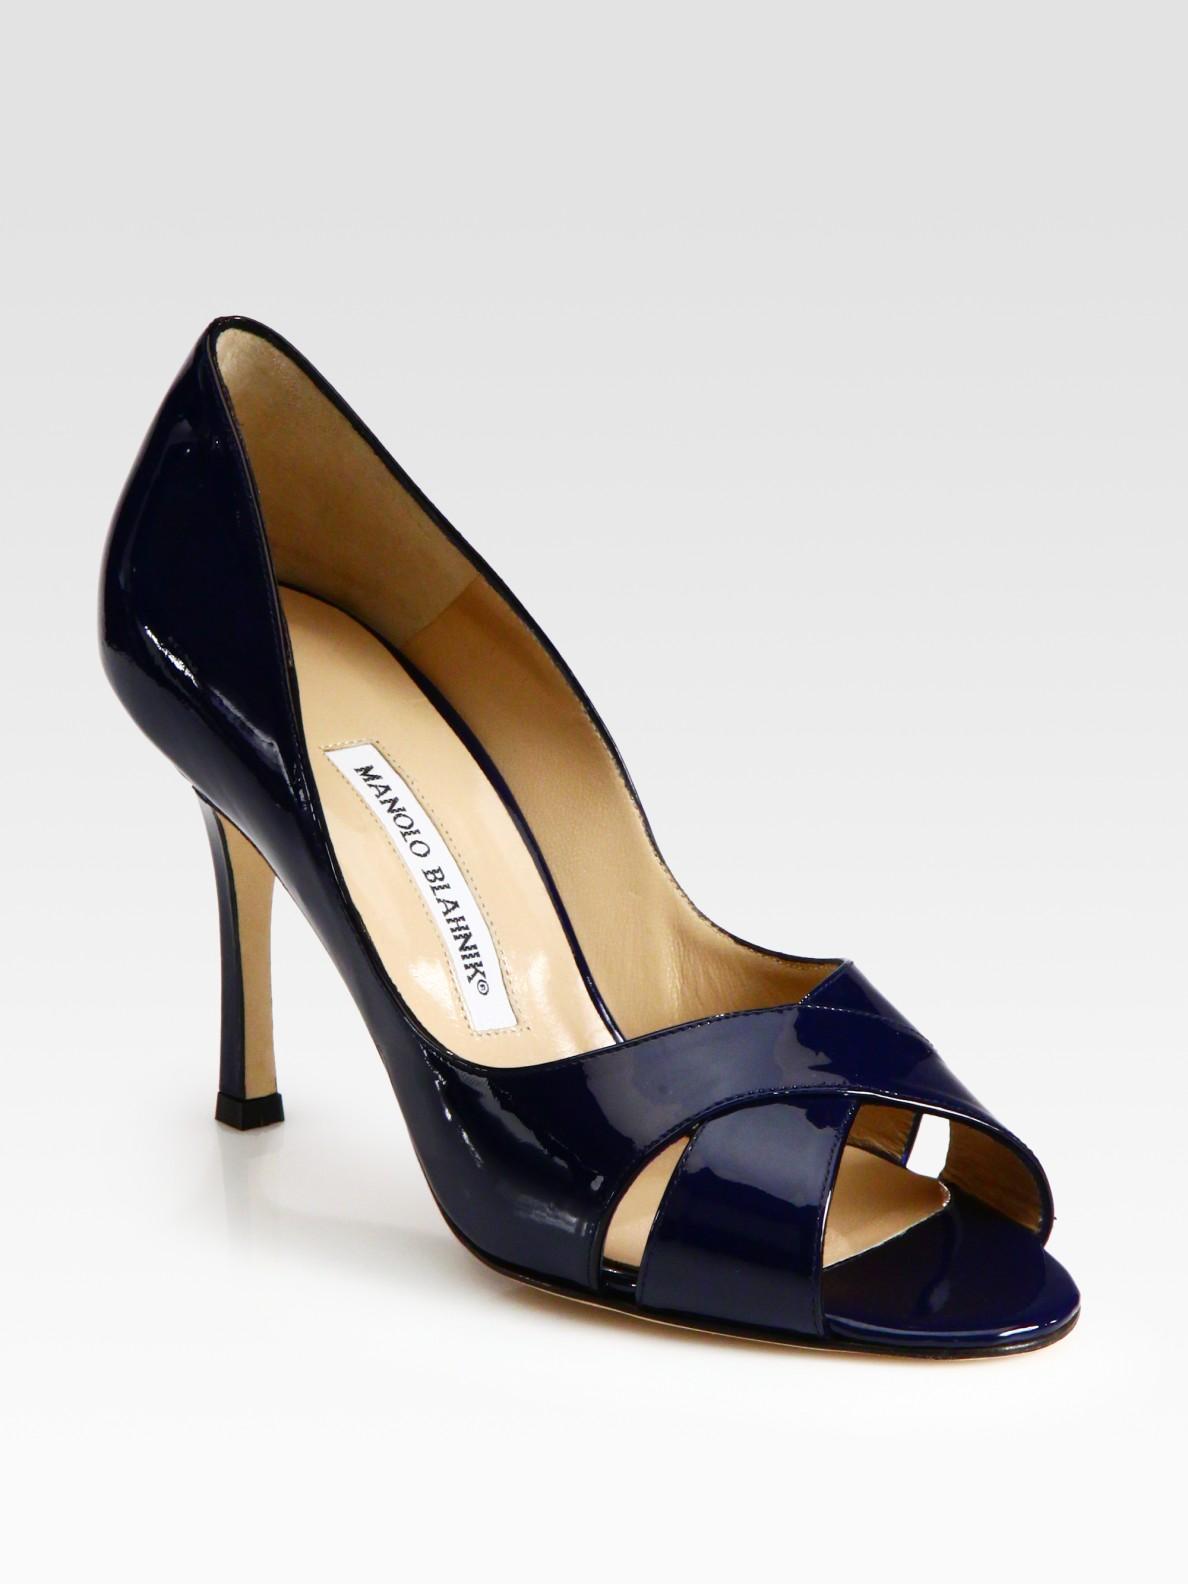 Lyst Manolo Blahnik Patent Leather Peep Toe Pumps In Blue